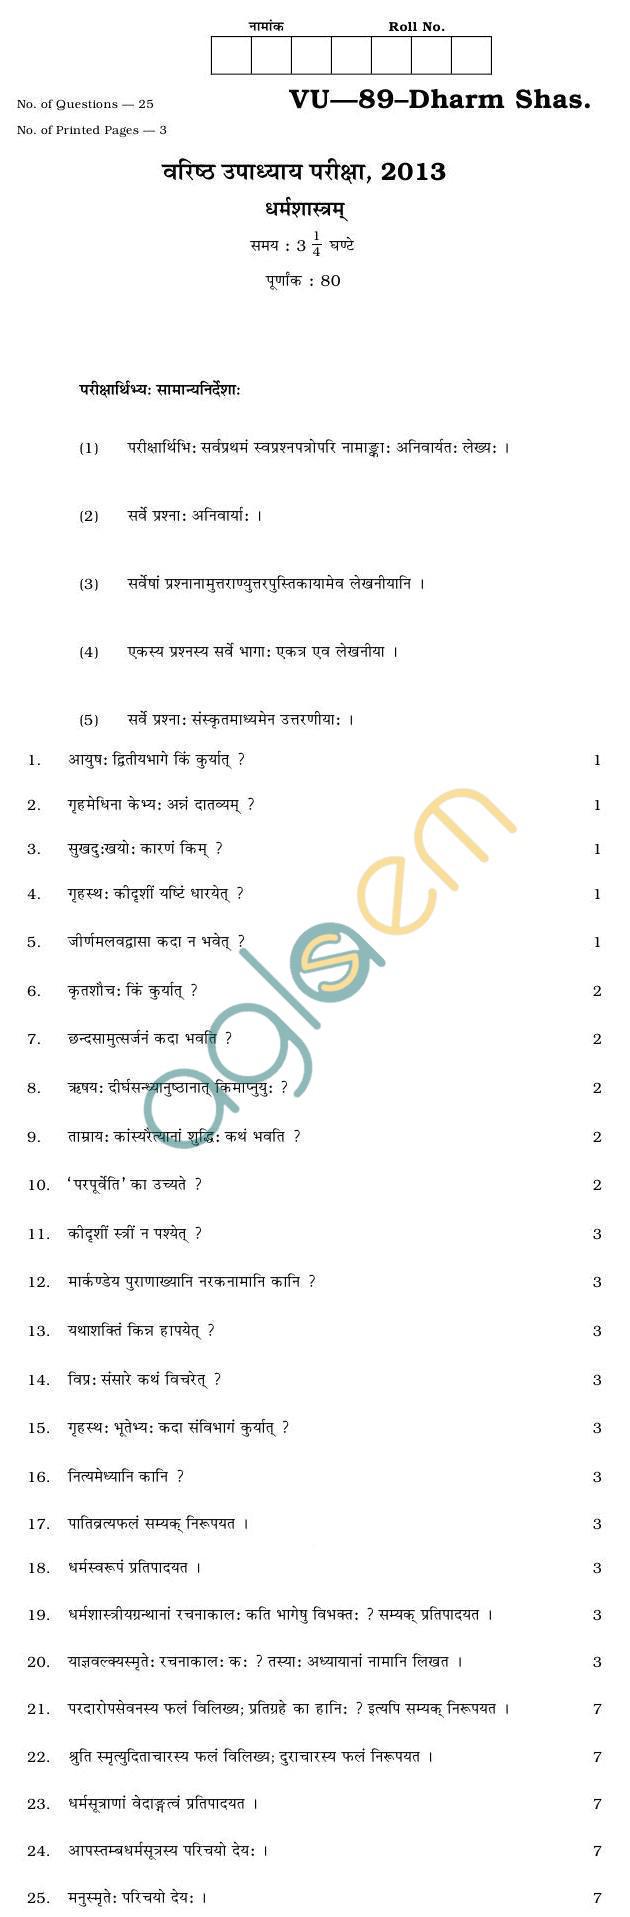 Rajasthan Board V Upadhyay Dharma Shastram Question Paper 2013